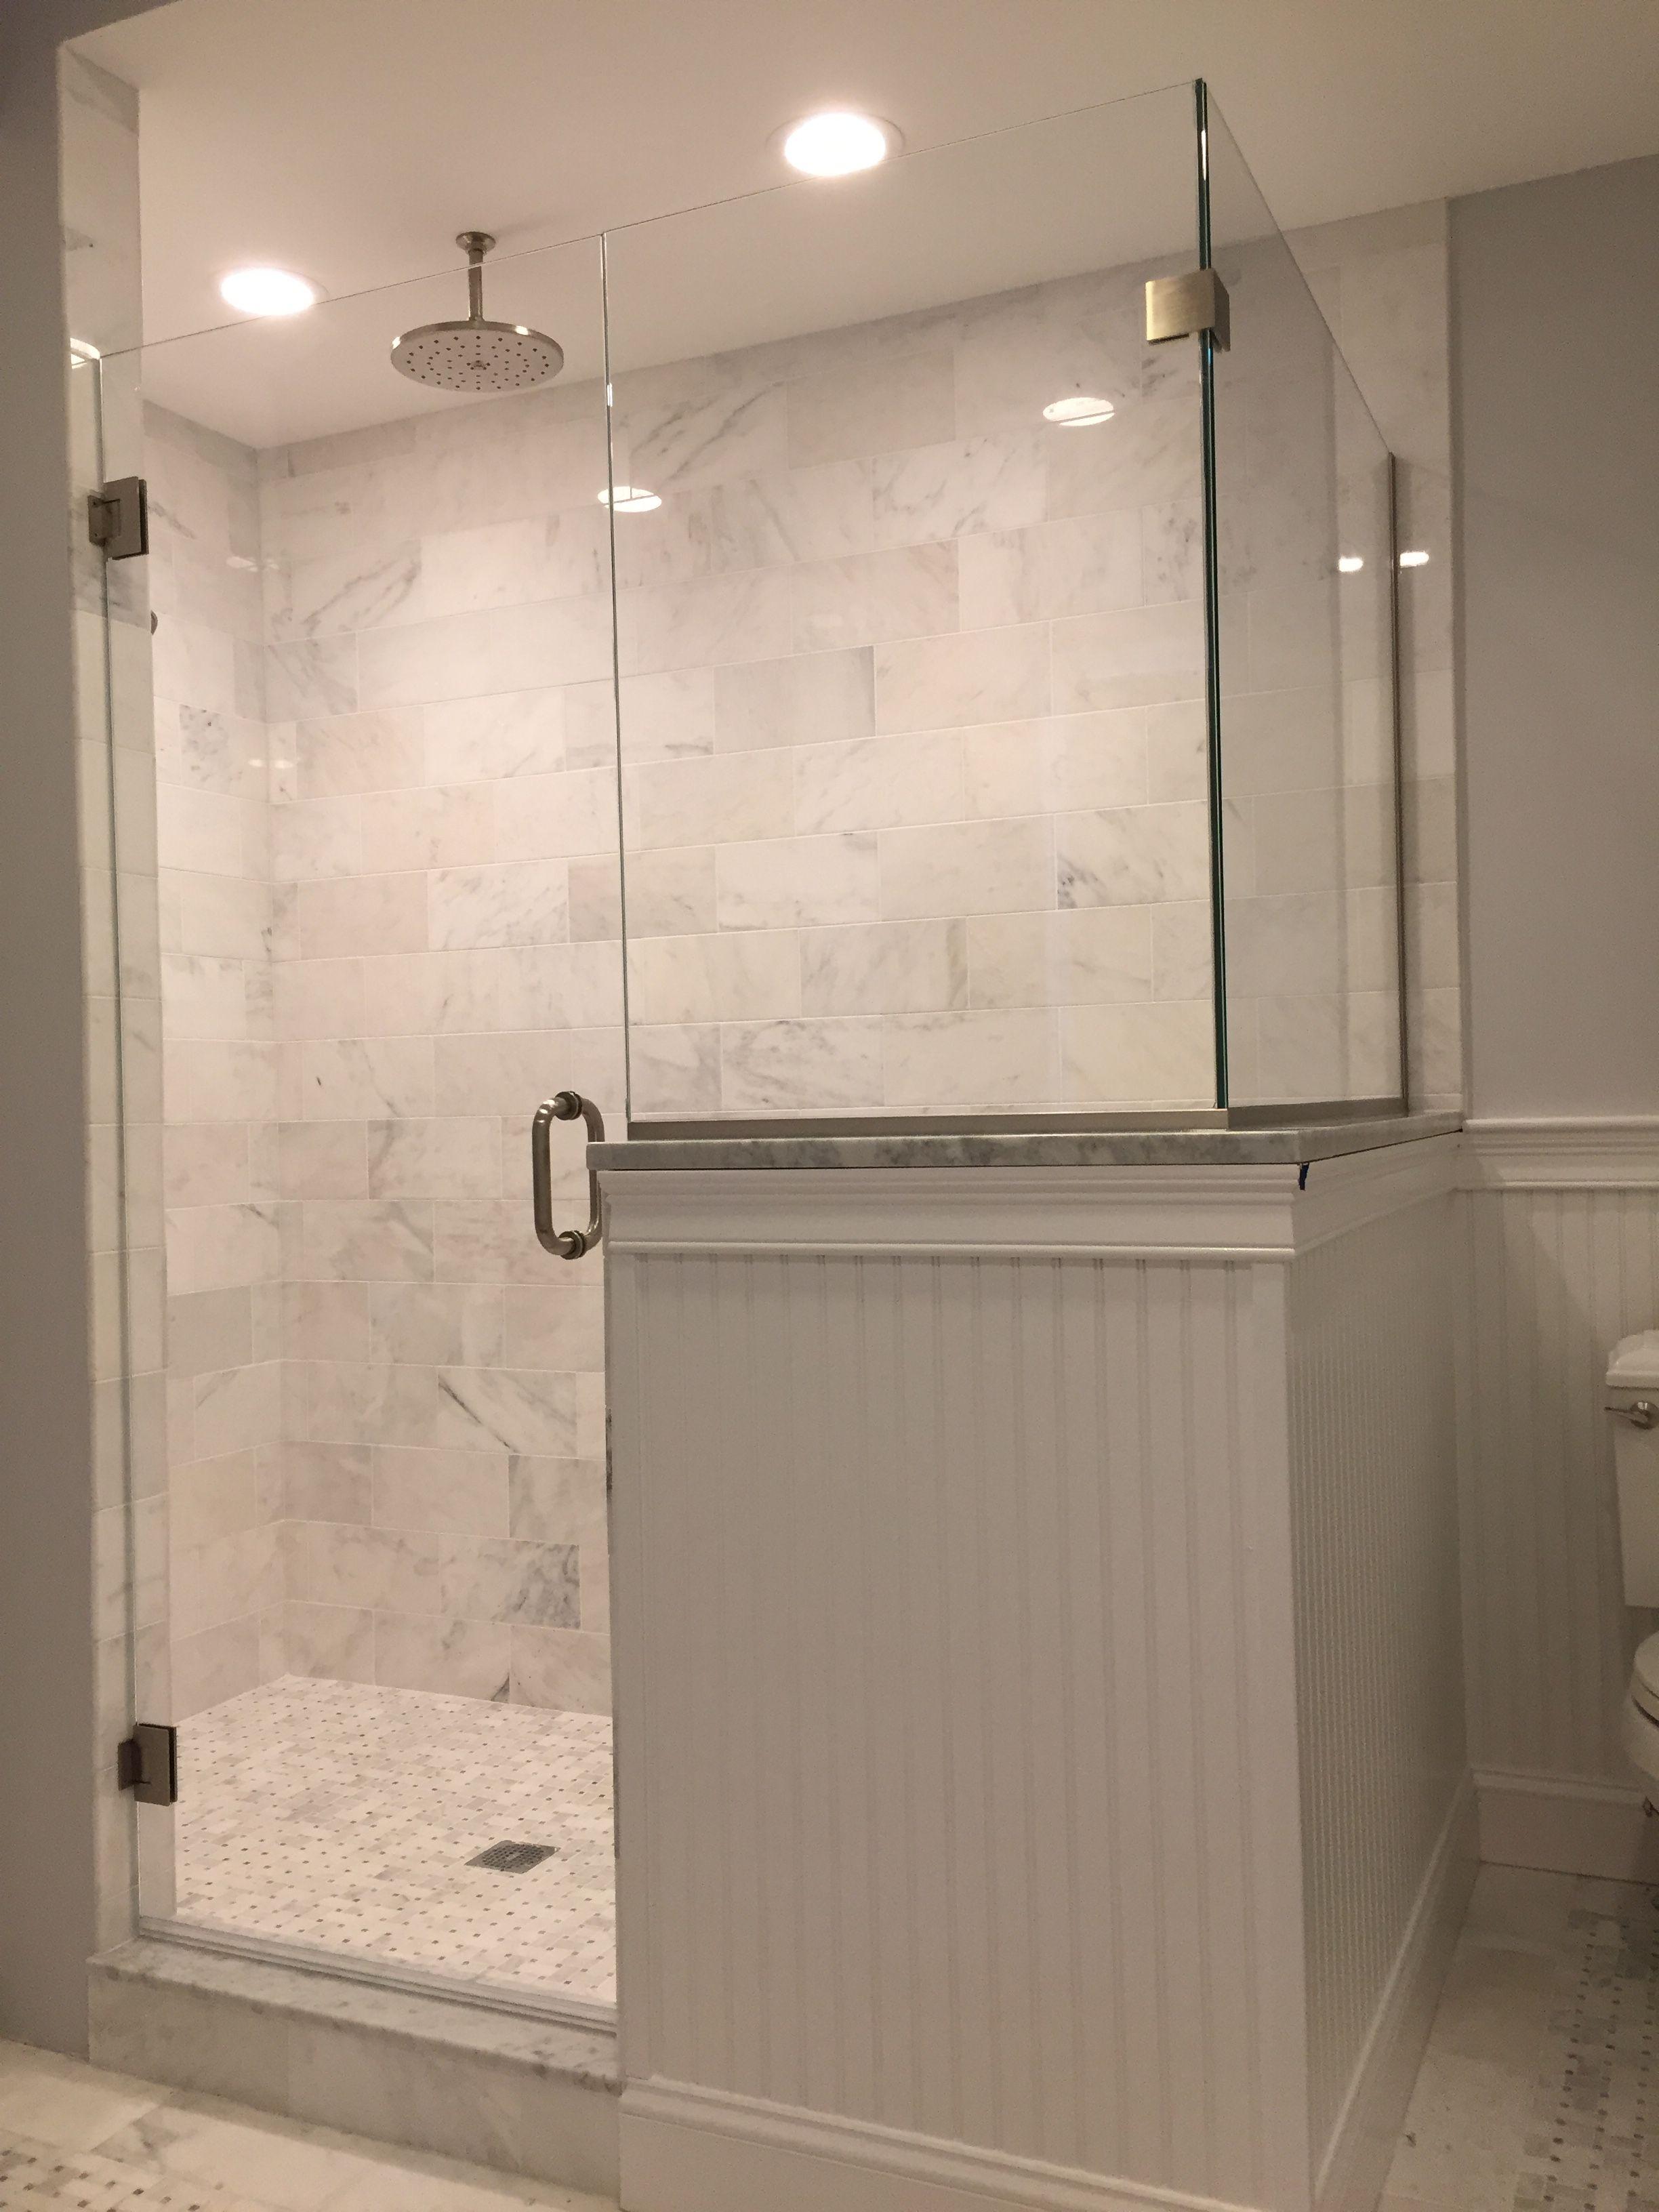 Image Result For Victorian Shower With Half Wall And Glass Shower Doors Half Wall Shower Glass Shower Doors Frameless